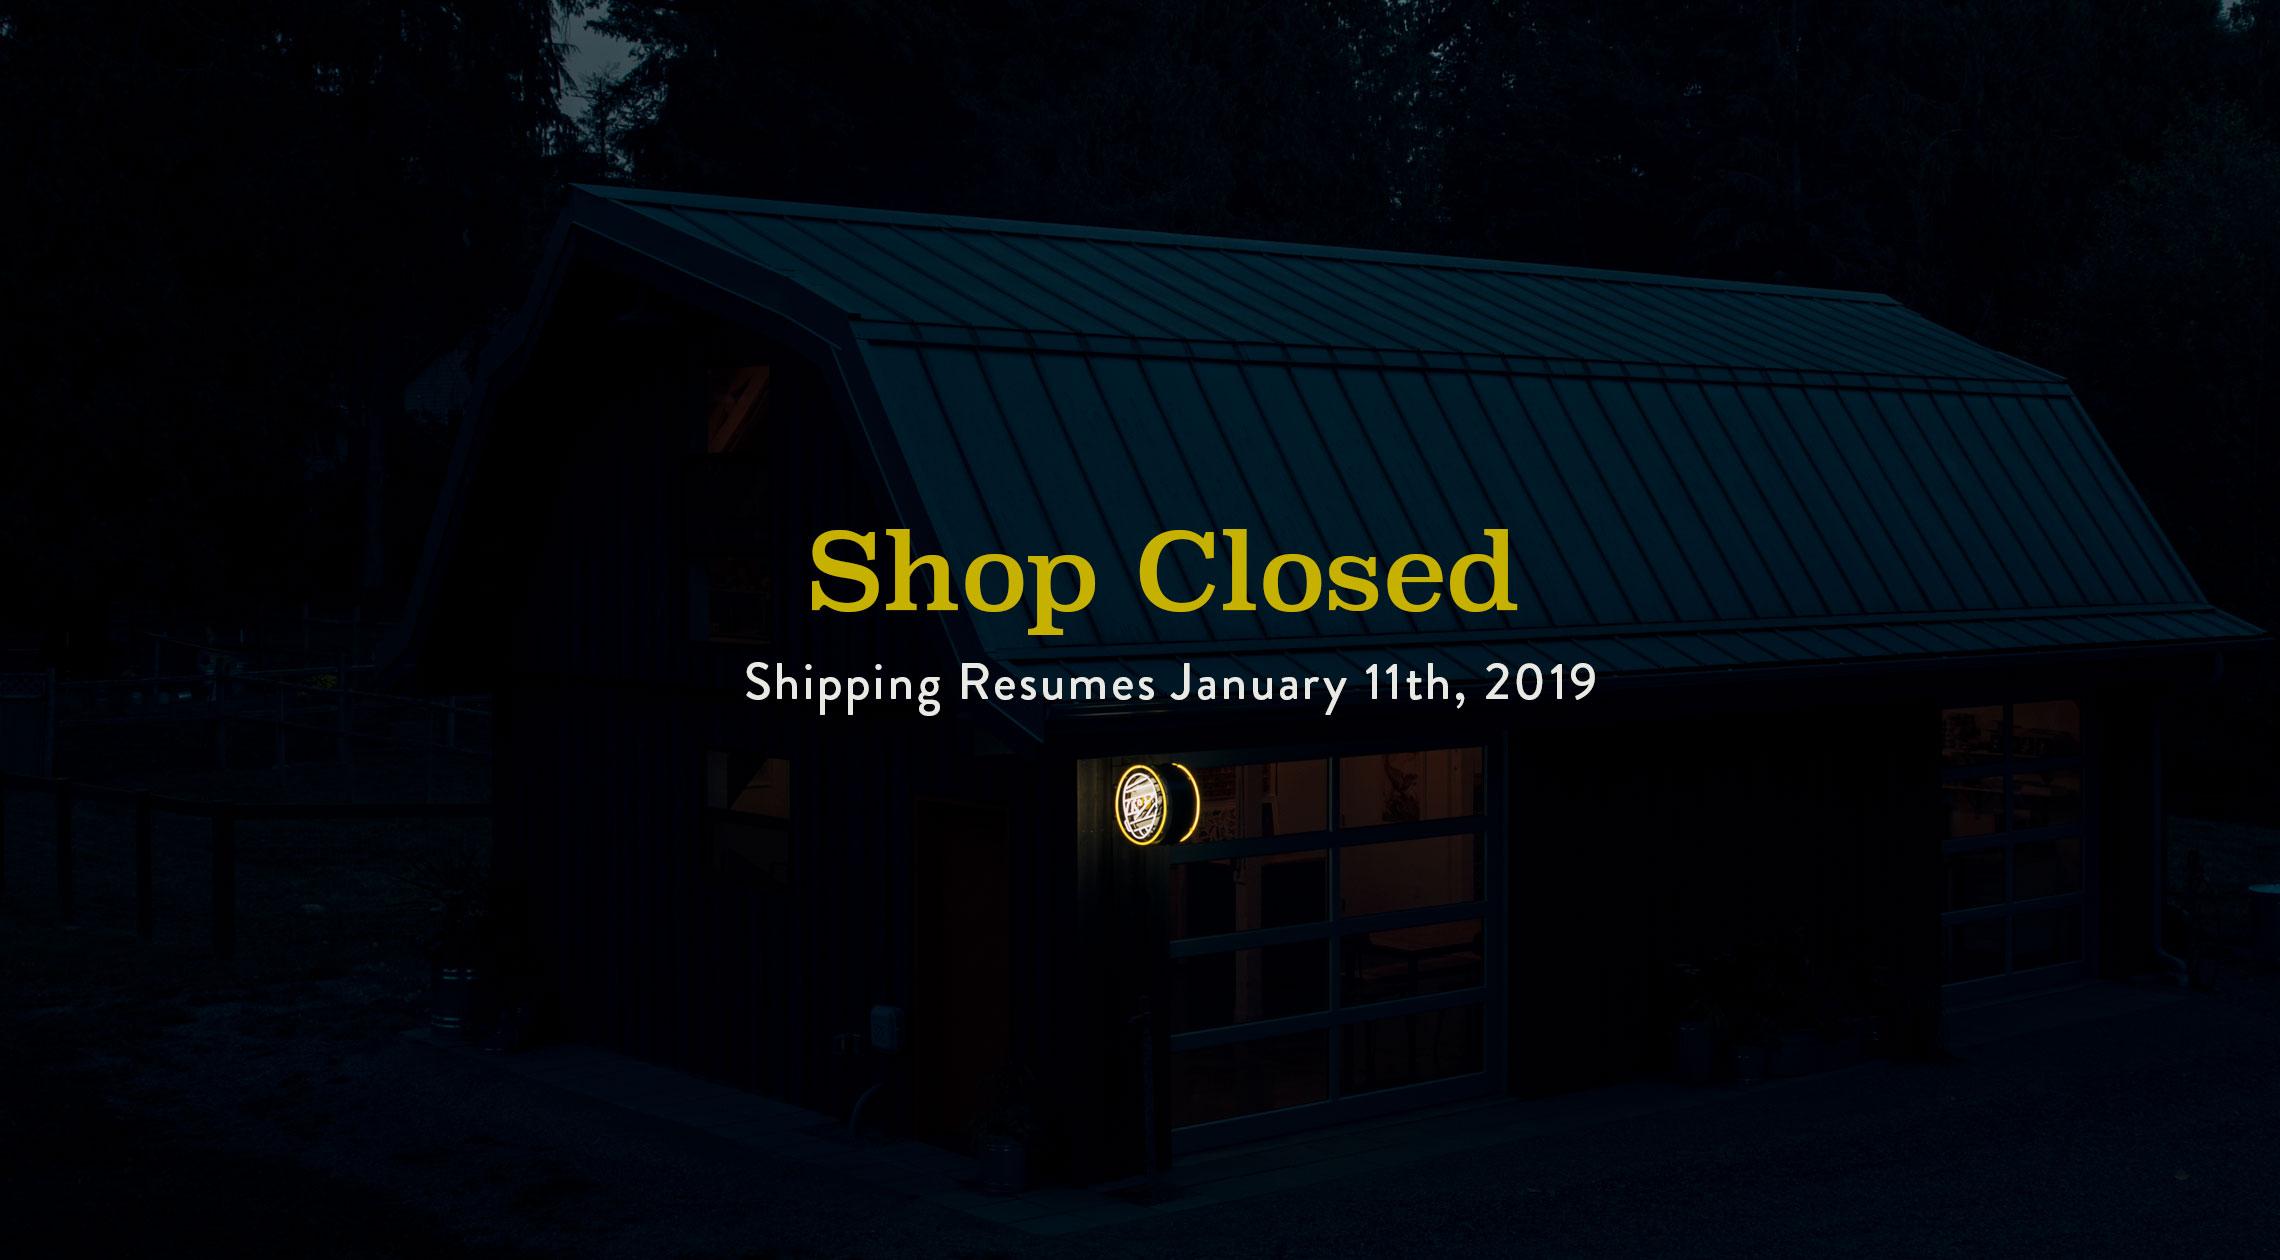 Shop-Closed-2019.jpg